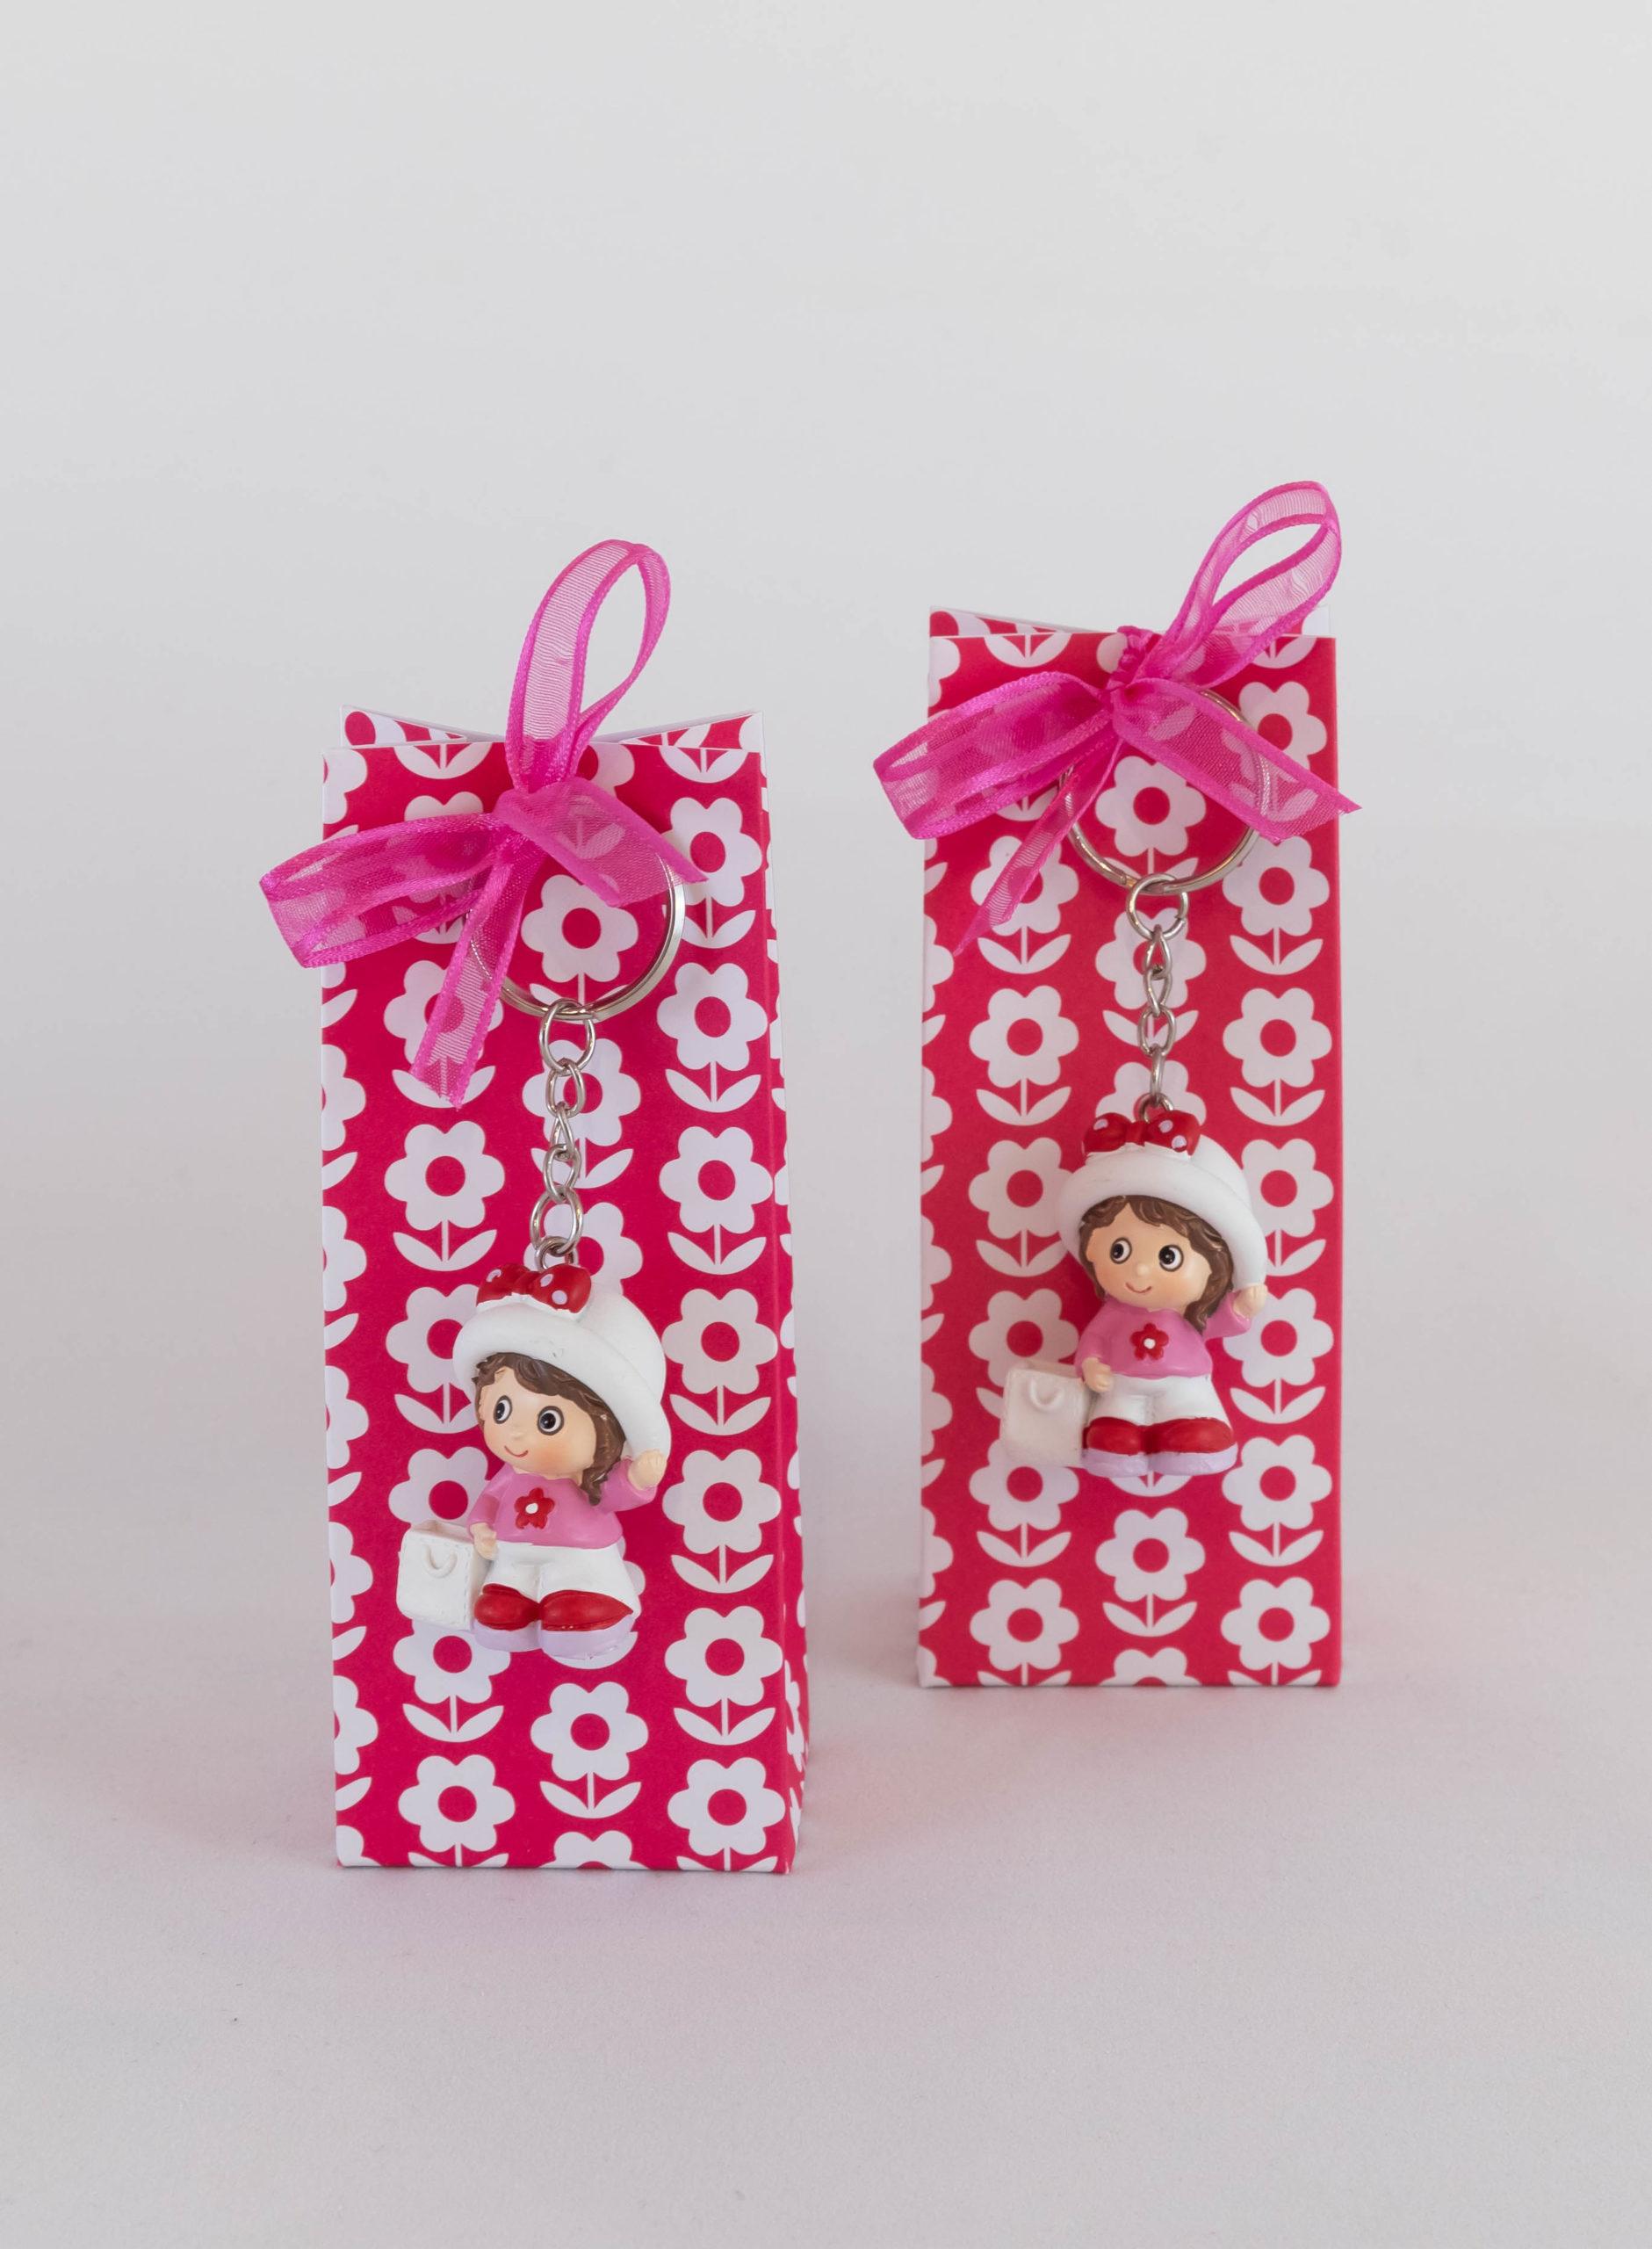 Boite porte-clé - Fille rose Image